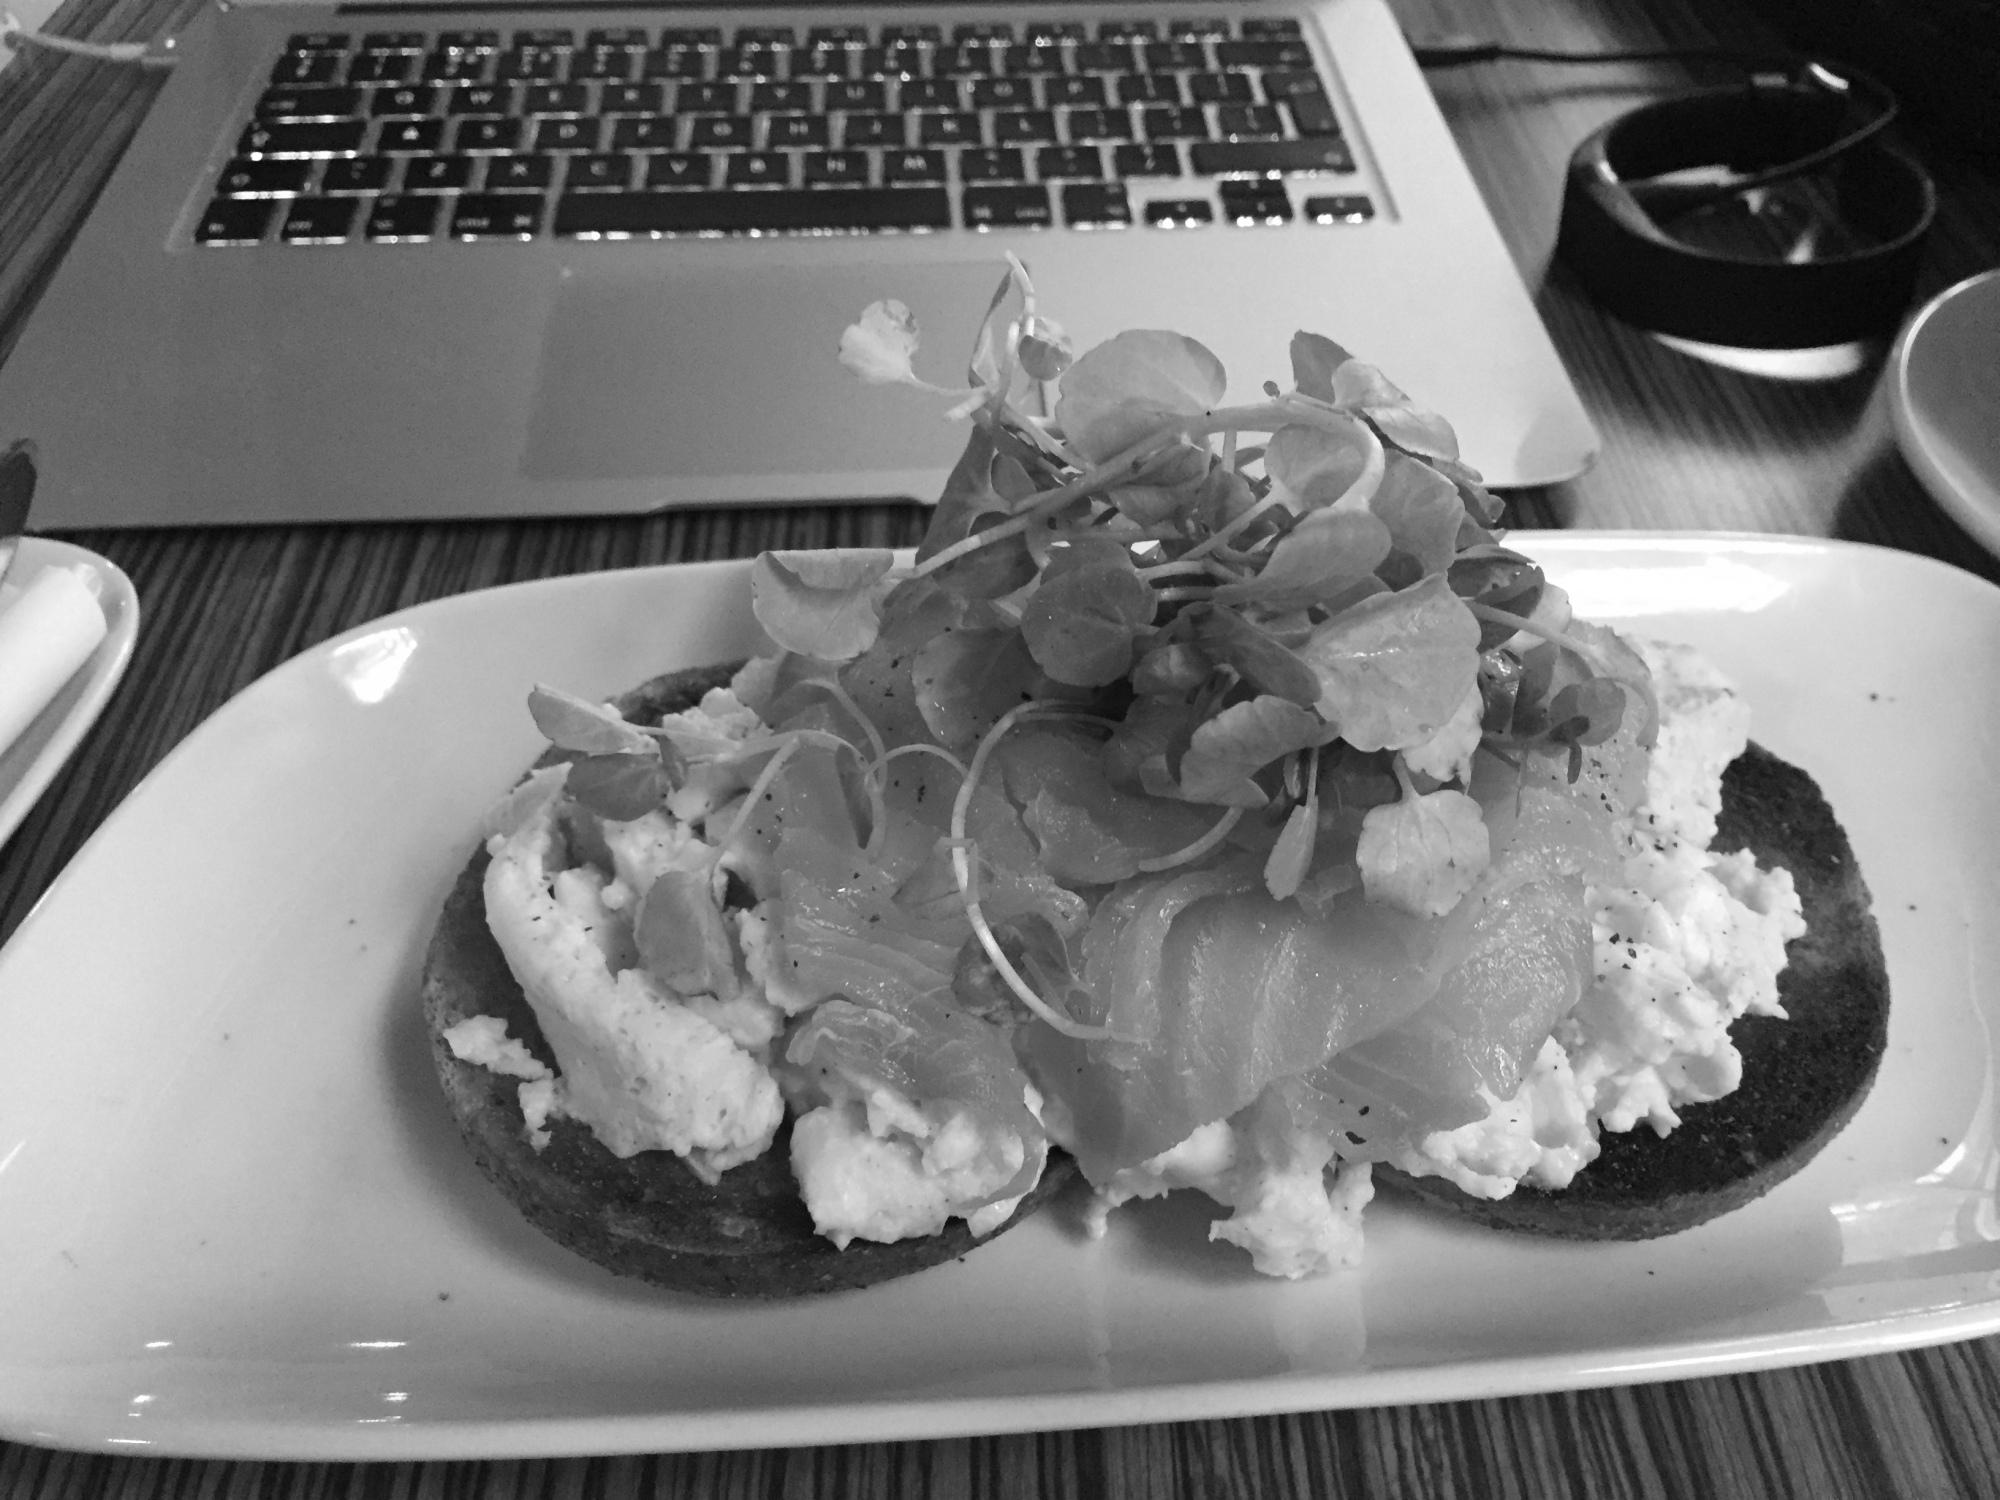 Antenna Nottingham New York Breakfast bagel mono